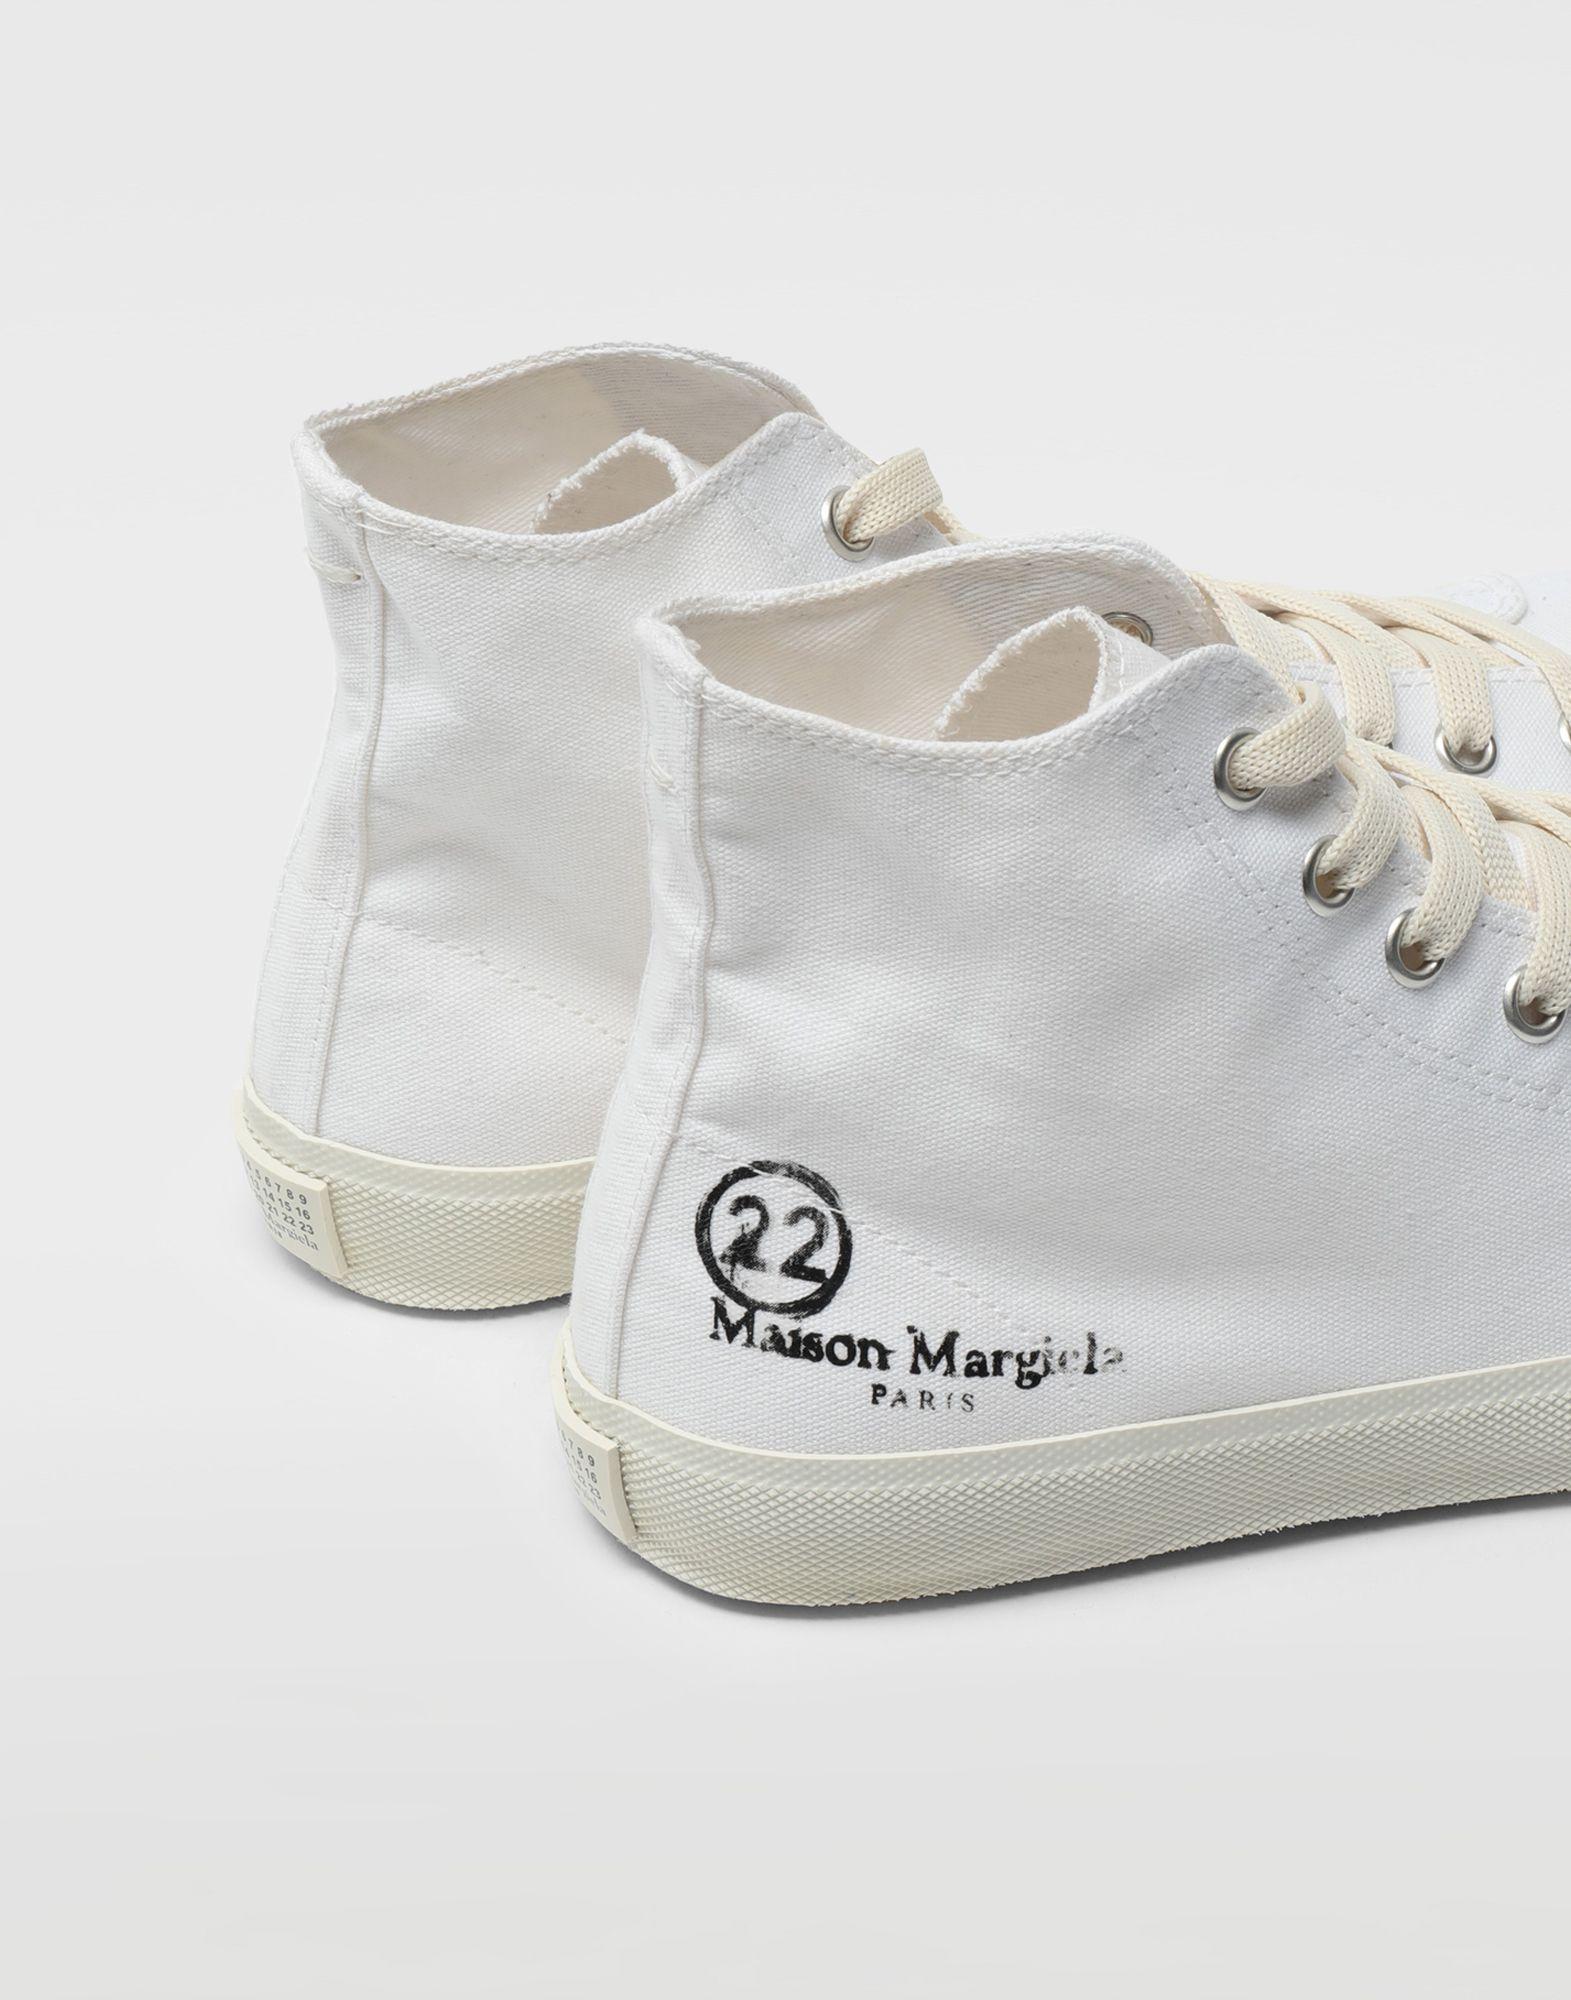 MAISON MARGIELA Baskets montantes Tabi Sneakers Tabi Homme a